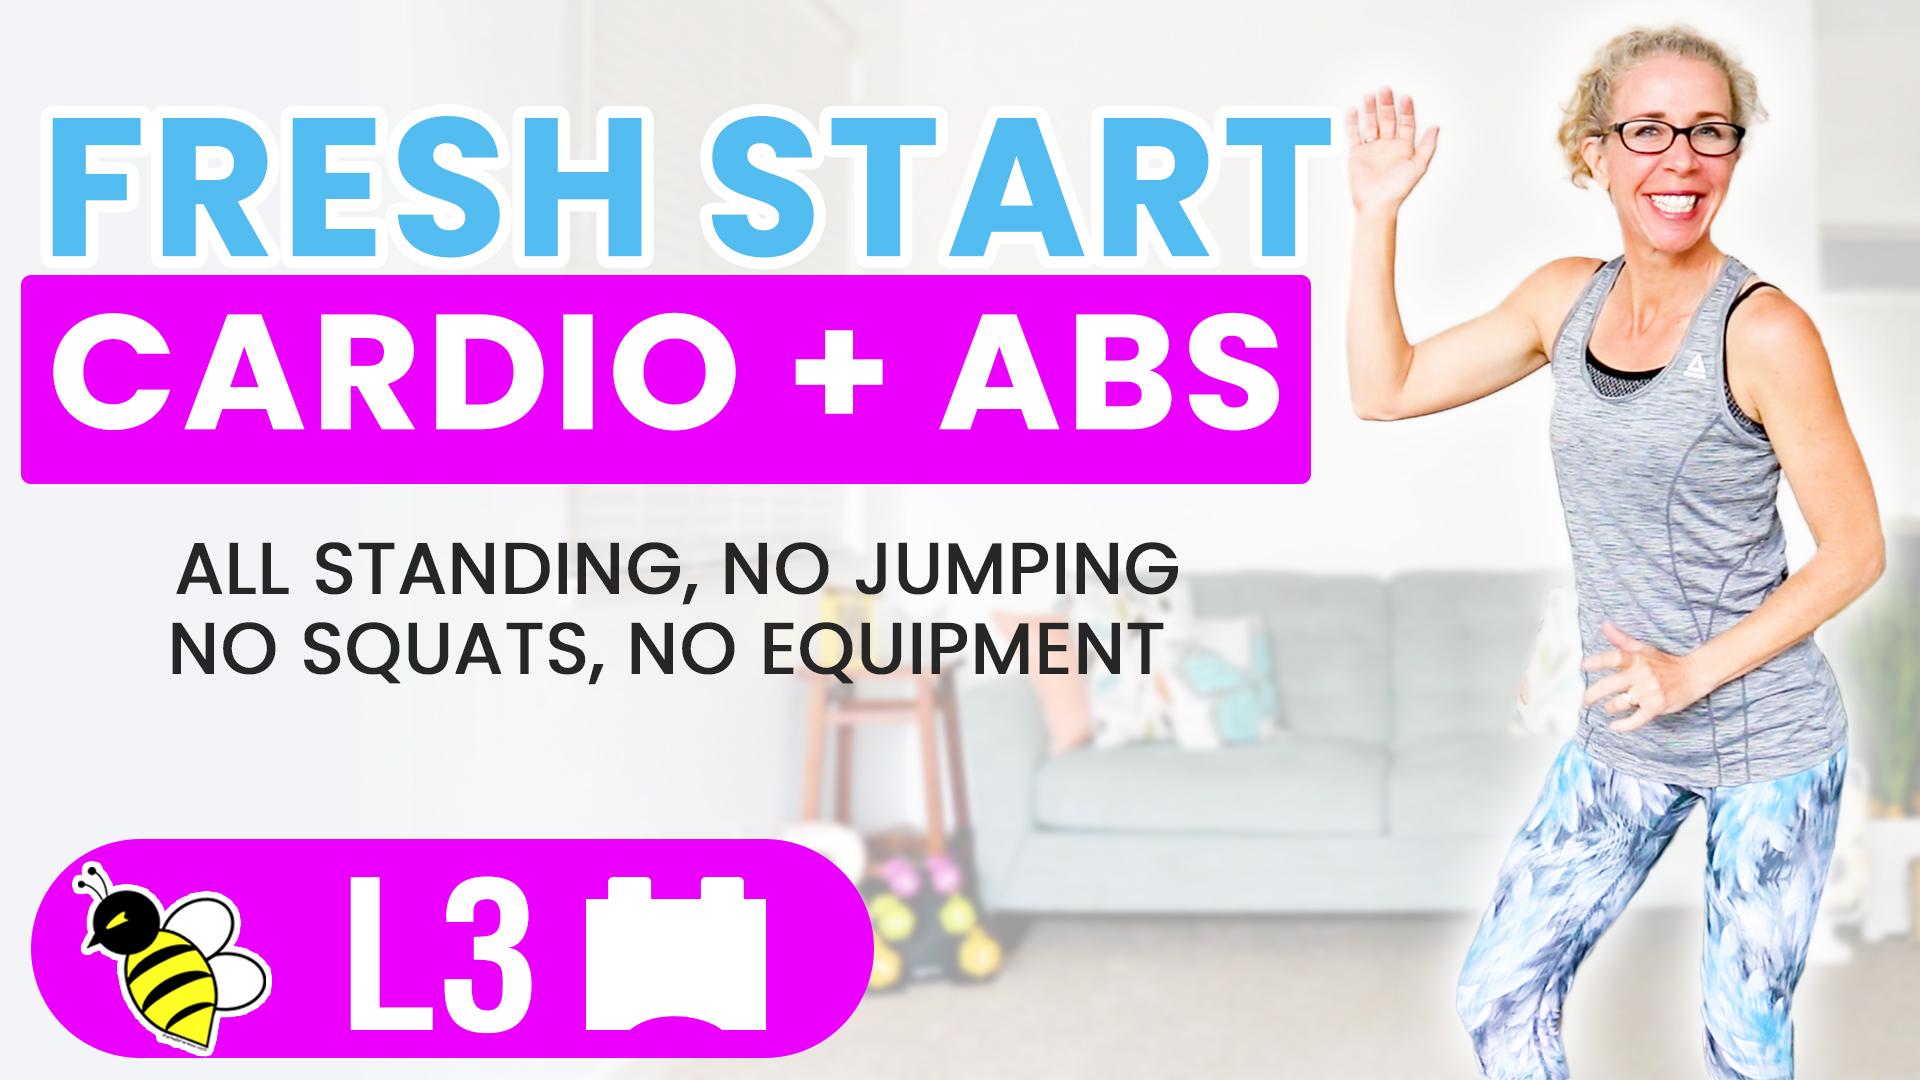 FUN Fresh Start CARDIO + Standing ABS 10 minute LOW IMPACT workout